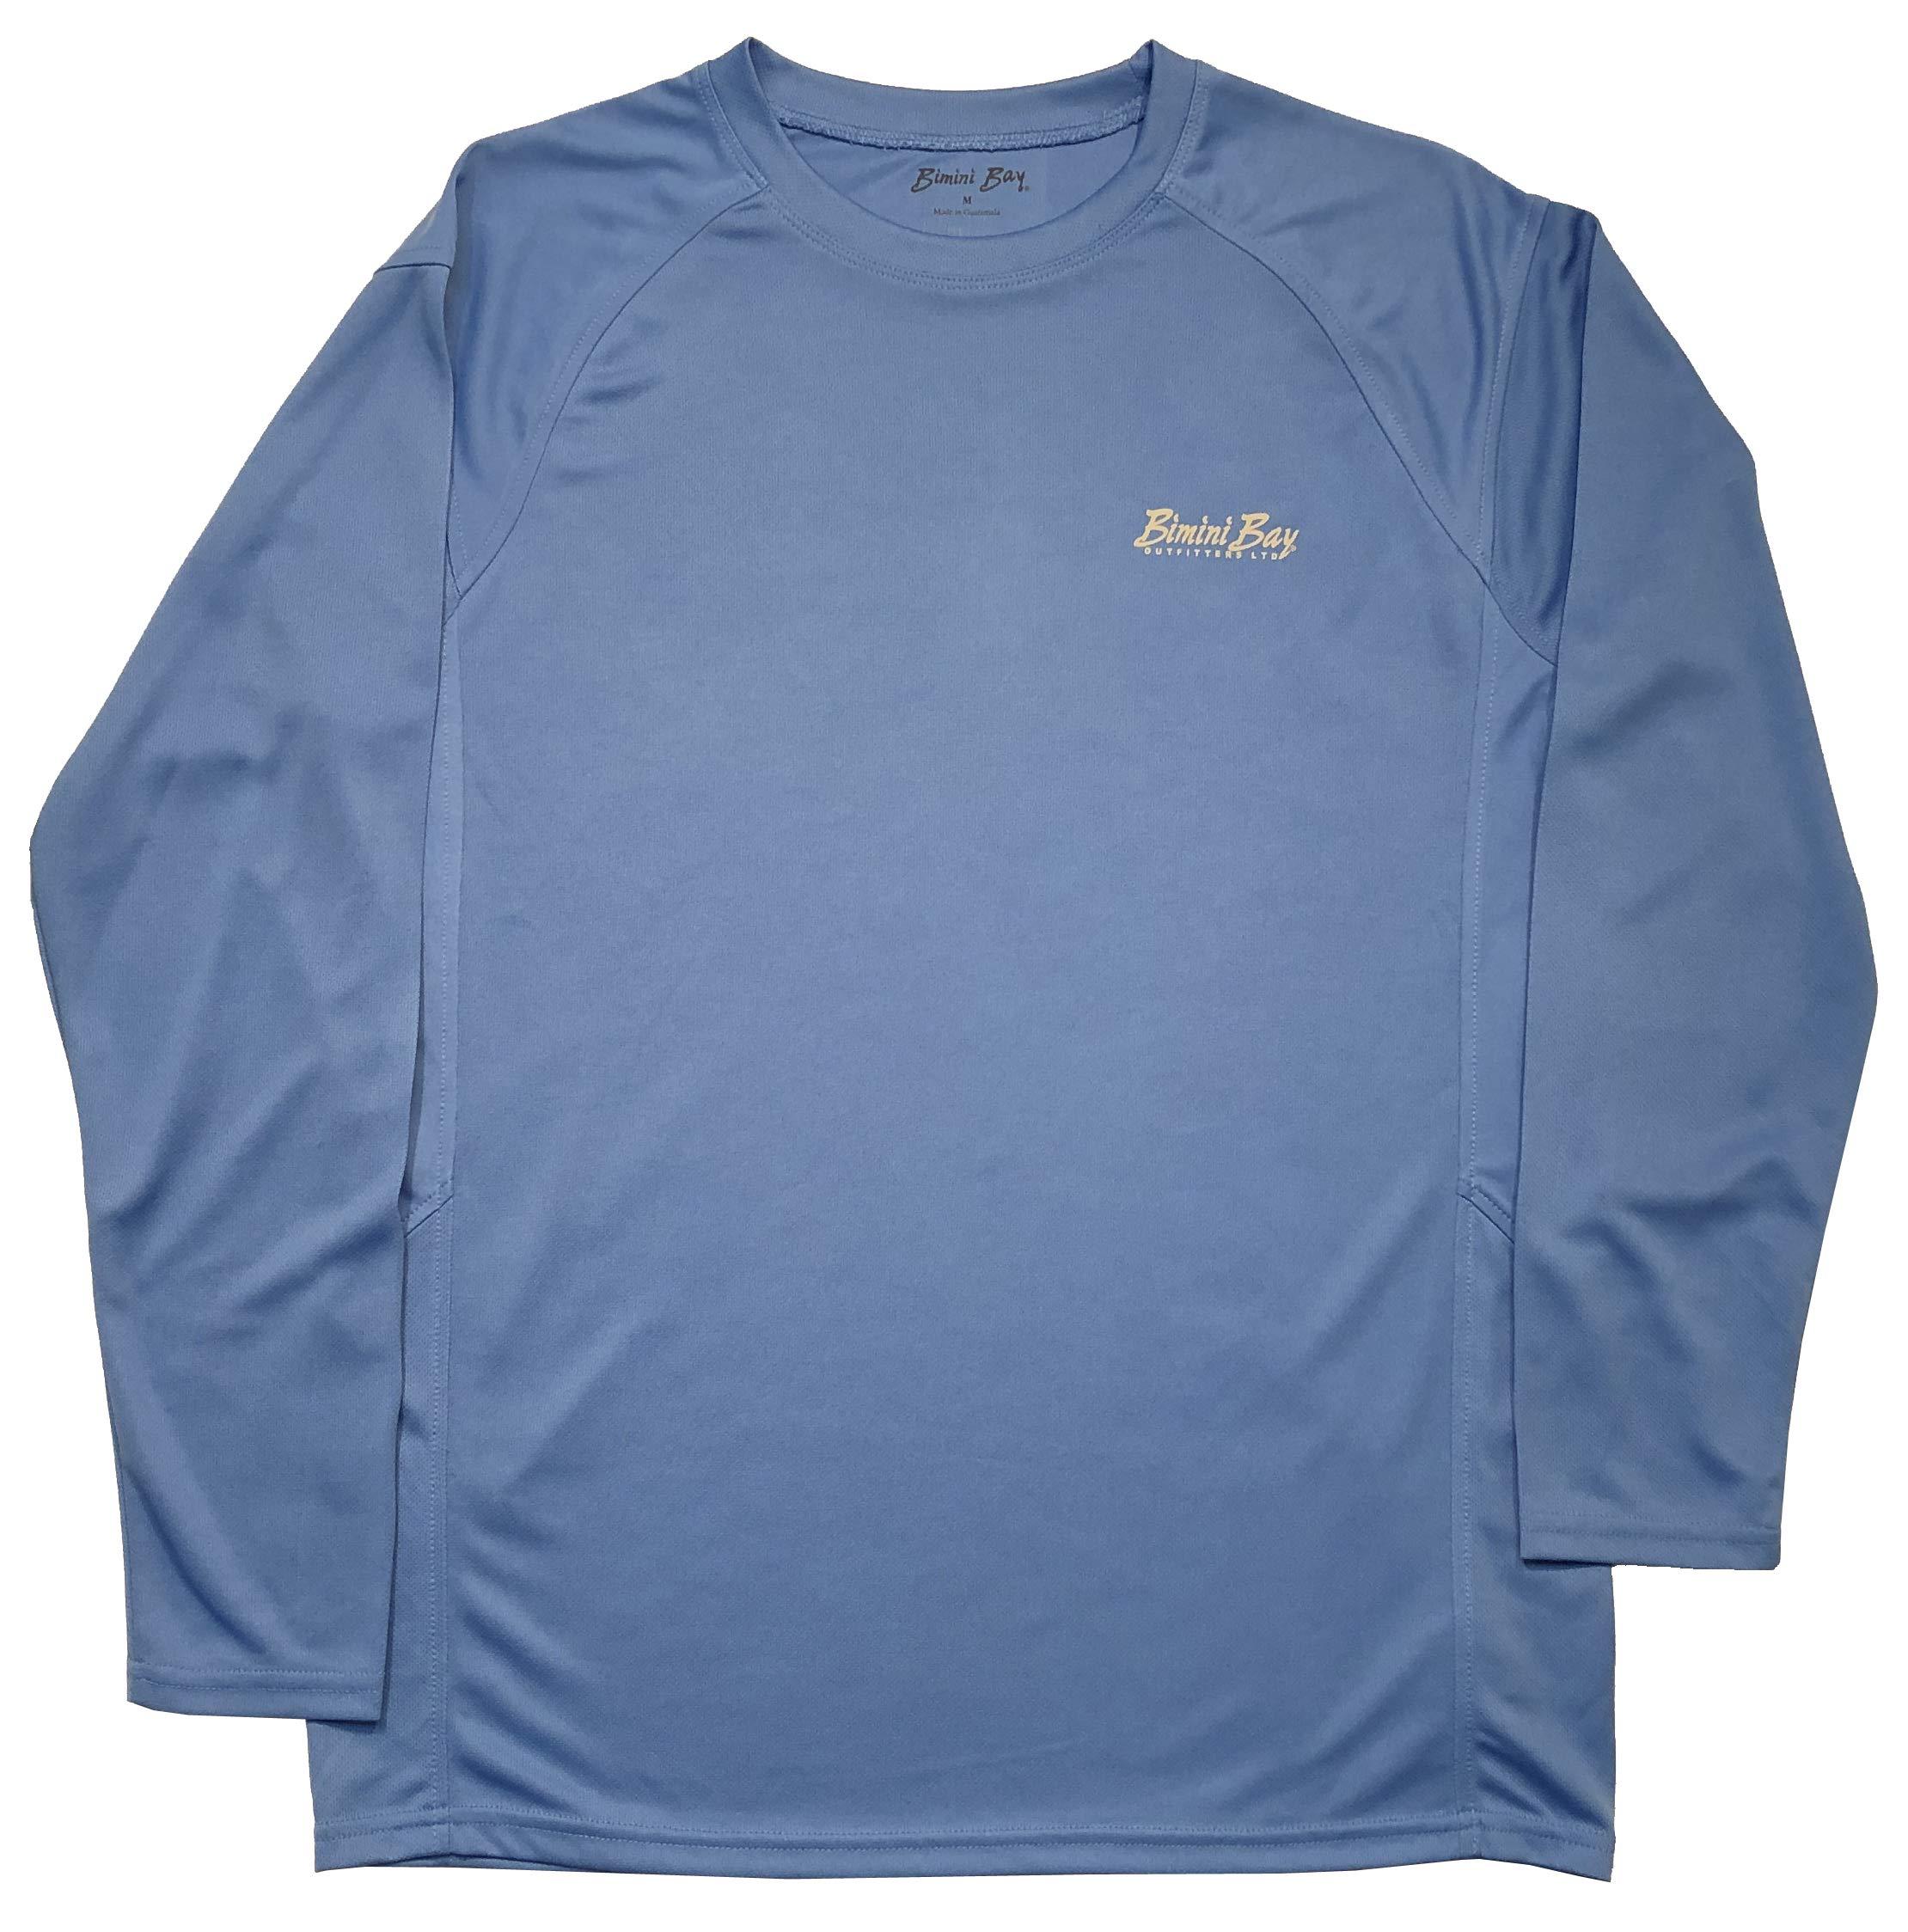 Bimini Bay Cabo Crew II Long Sleeve Shirt (X-Large, Marine) by Bimini Bay Outfitters